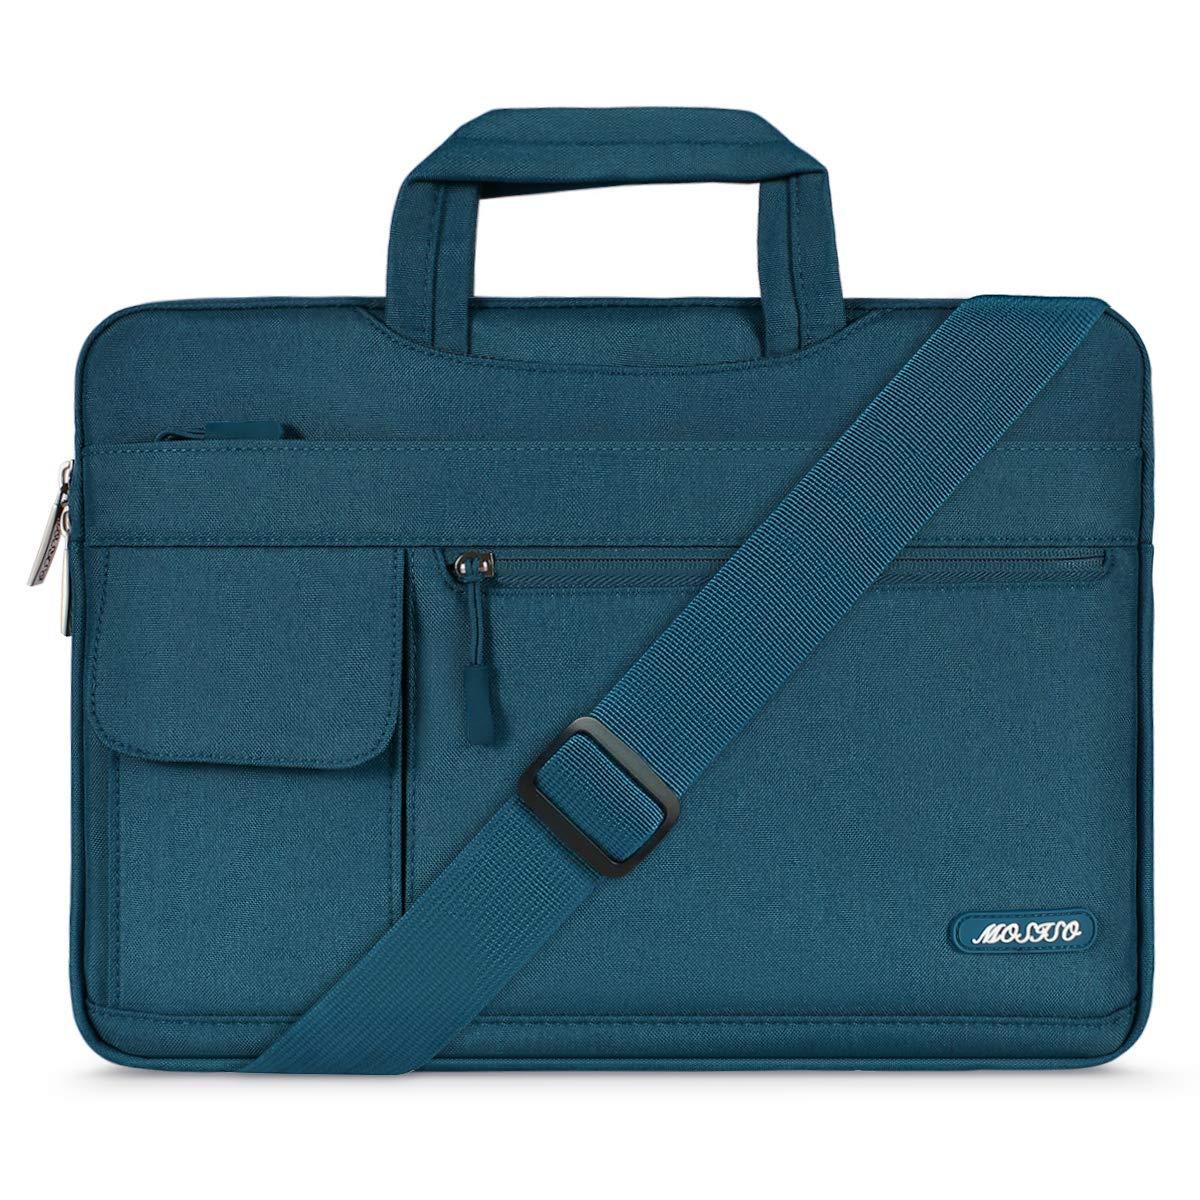 MOSISO Funda Protectora Compatible con 2019 MacBook Pro 16 A2141/15-15.6 Mac Pro Retina/Surface Lenovo HP Acer ASUS de Portátil, Bolsa de Hombro Blanda Maletín Bandolera de Estilo Flap,T